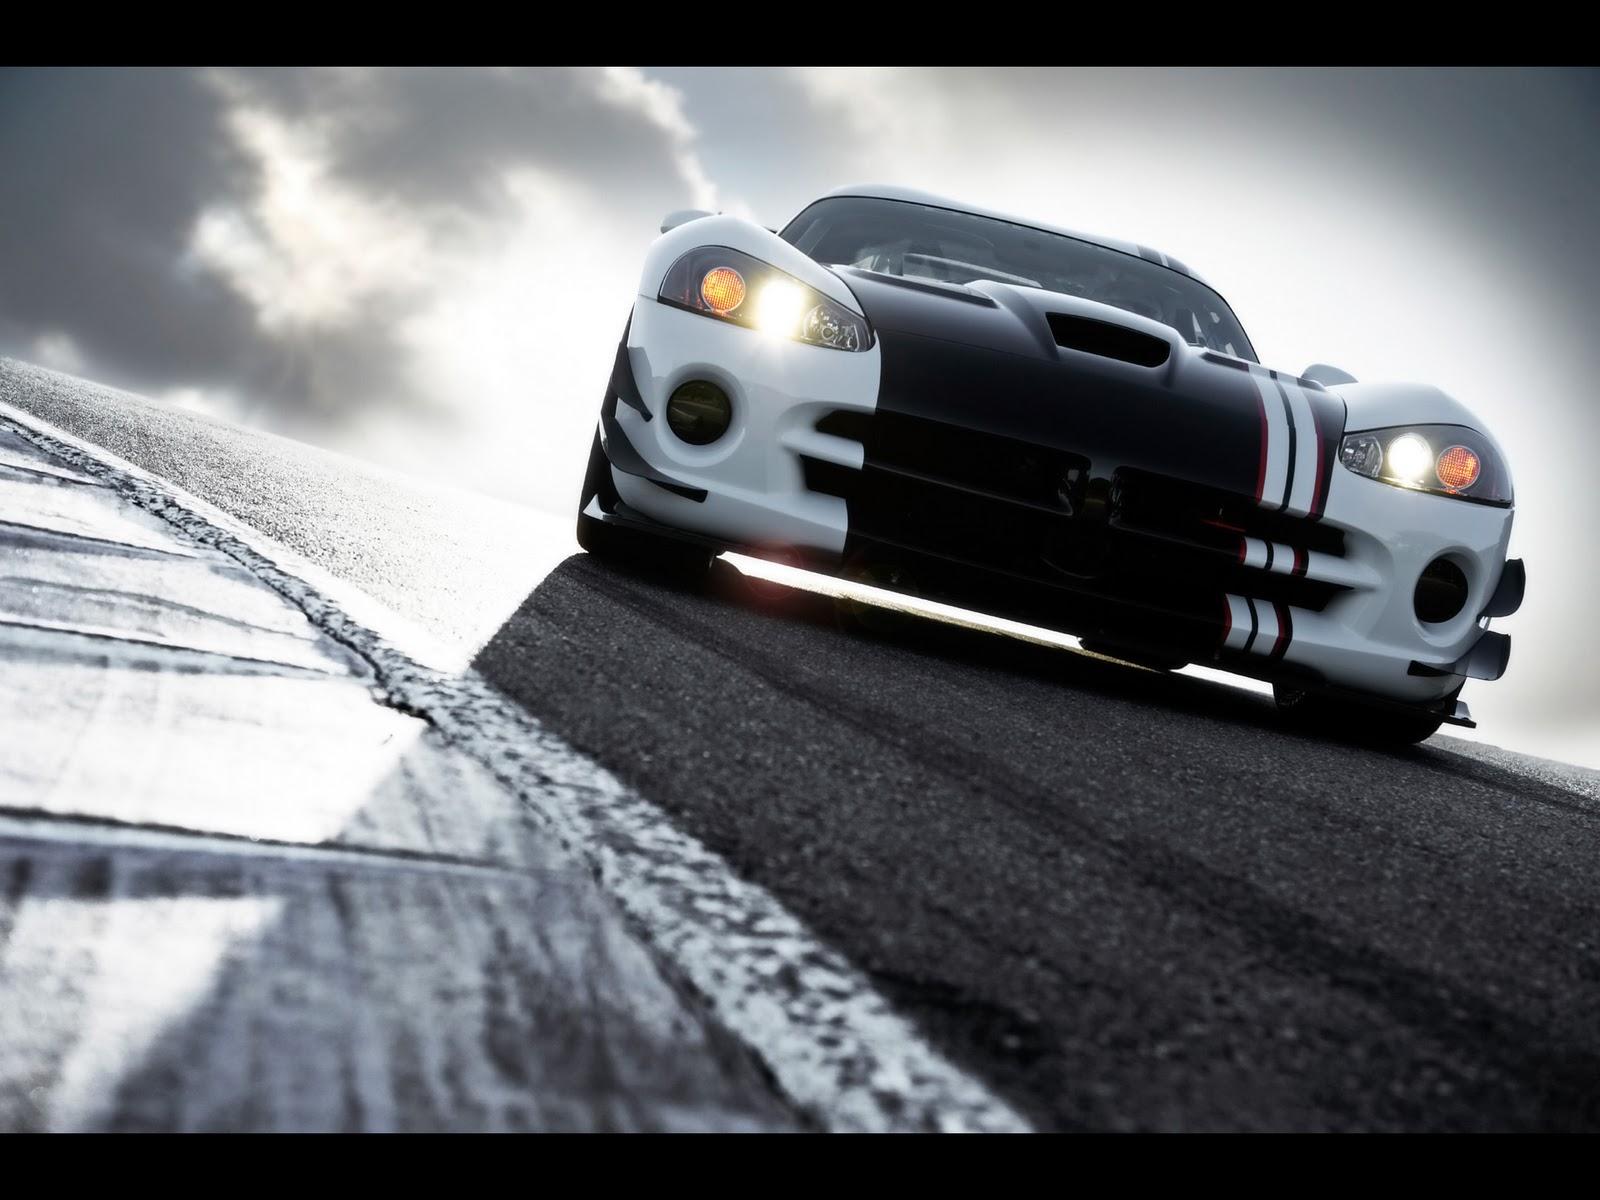 https://3.bp.blogspot.com/-SpwMtQnqg6E/UPh6fOymPQI/AAAAAAAAPJU/5xi6TO4OF1g/s1600/2010-Dodge-Viper-SRT10-ACR-X-Front-Angle-Tilt-2-1920x1440.jpg